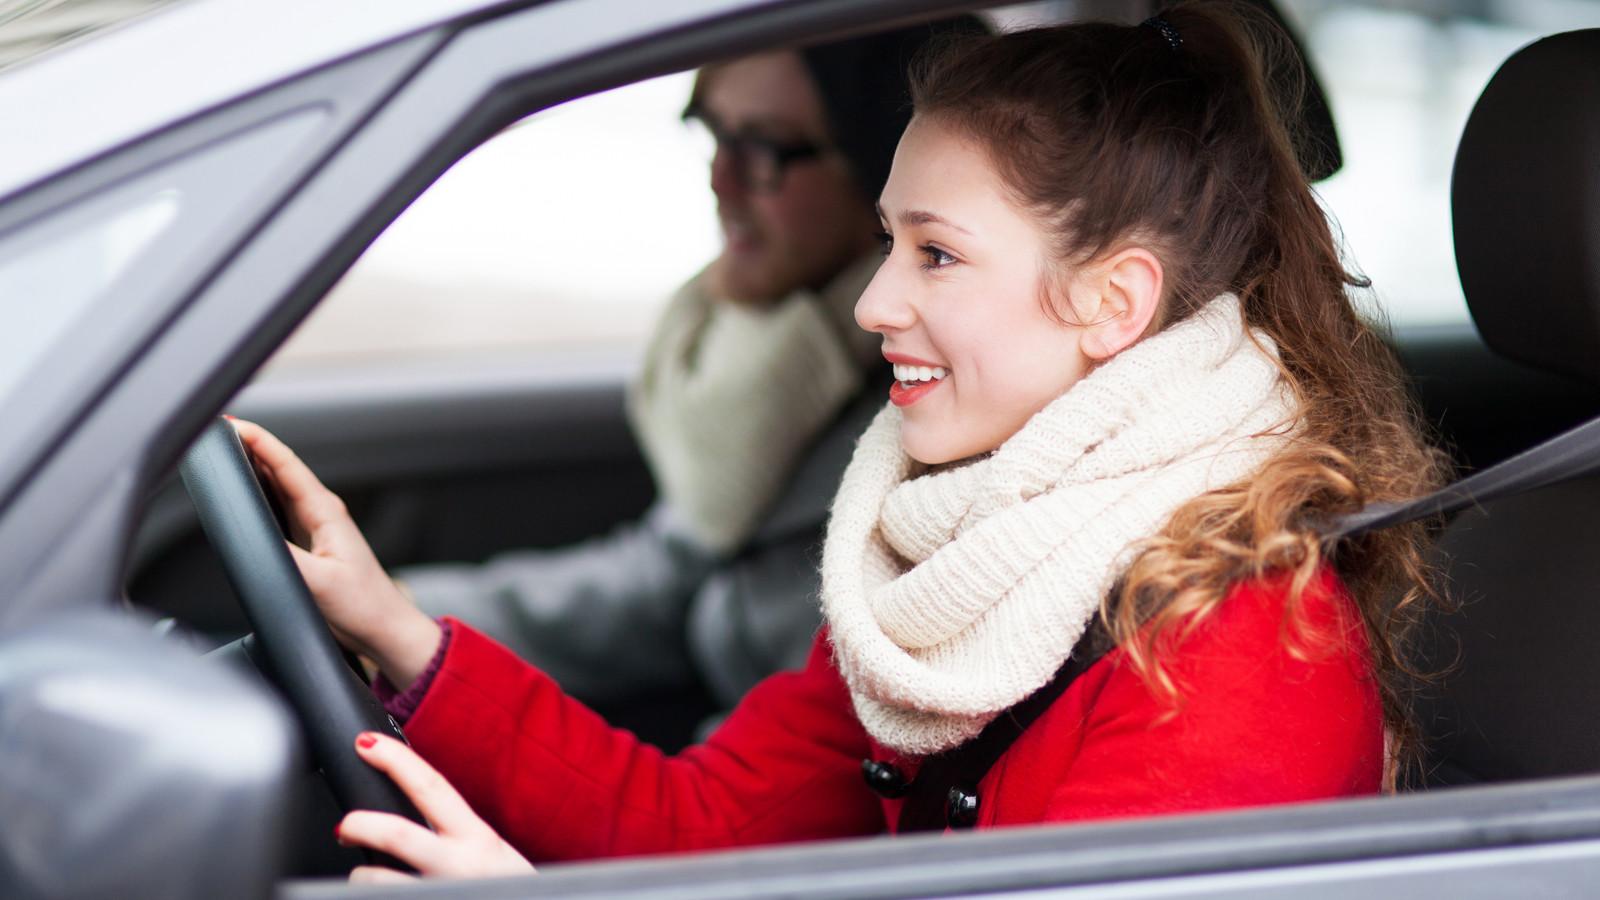 Статистка аварий повине начинающих водителей снизились